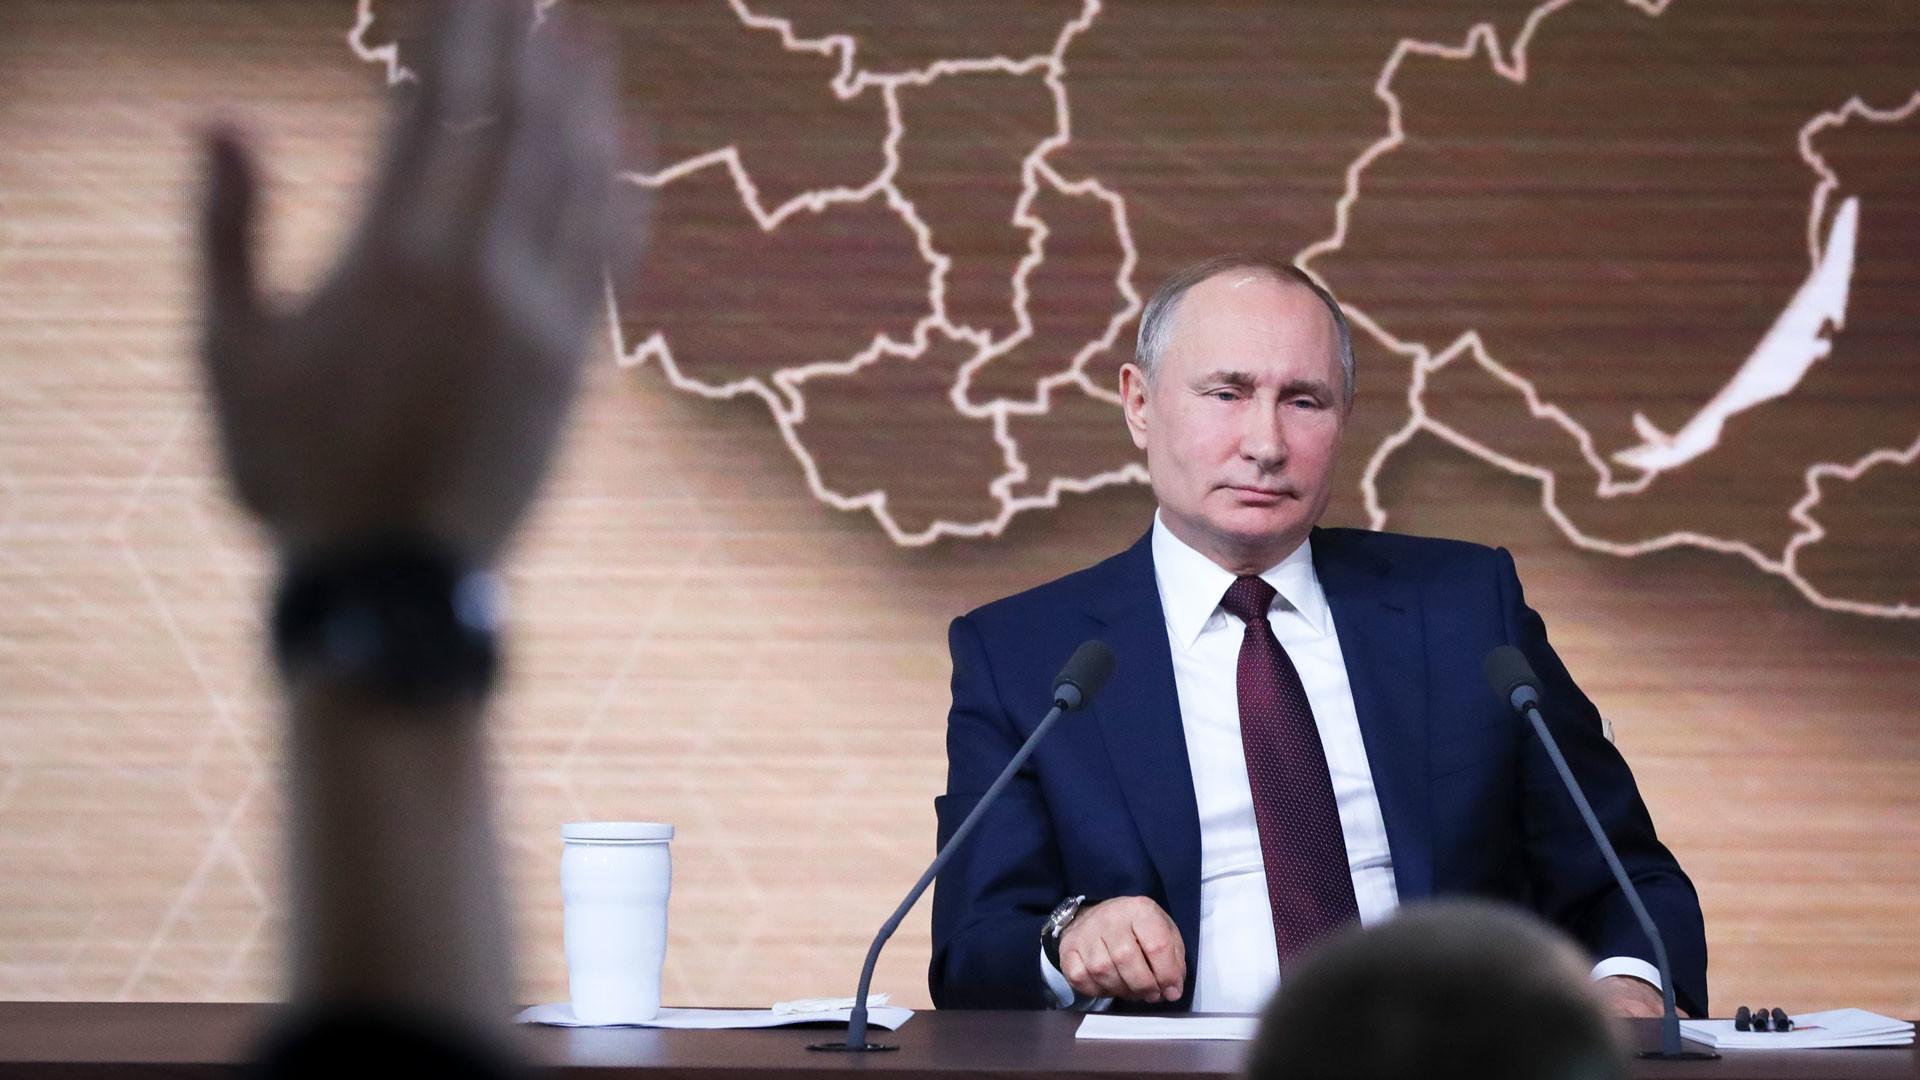 <p>Фото © Mikhail Klimentyev, Sputnik, Kremlin Pool Photo via AP</p>